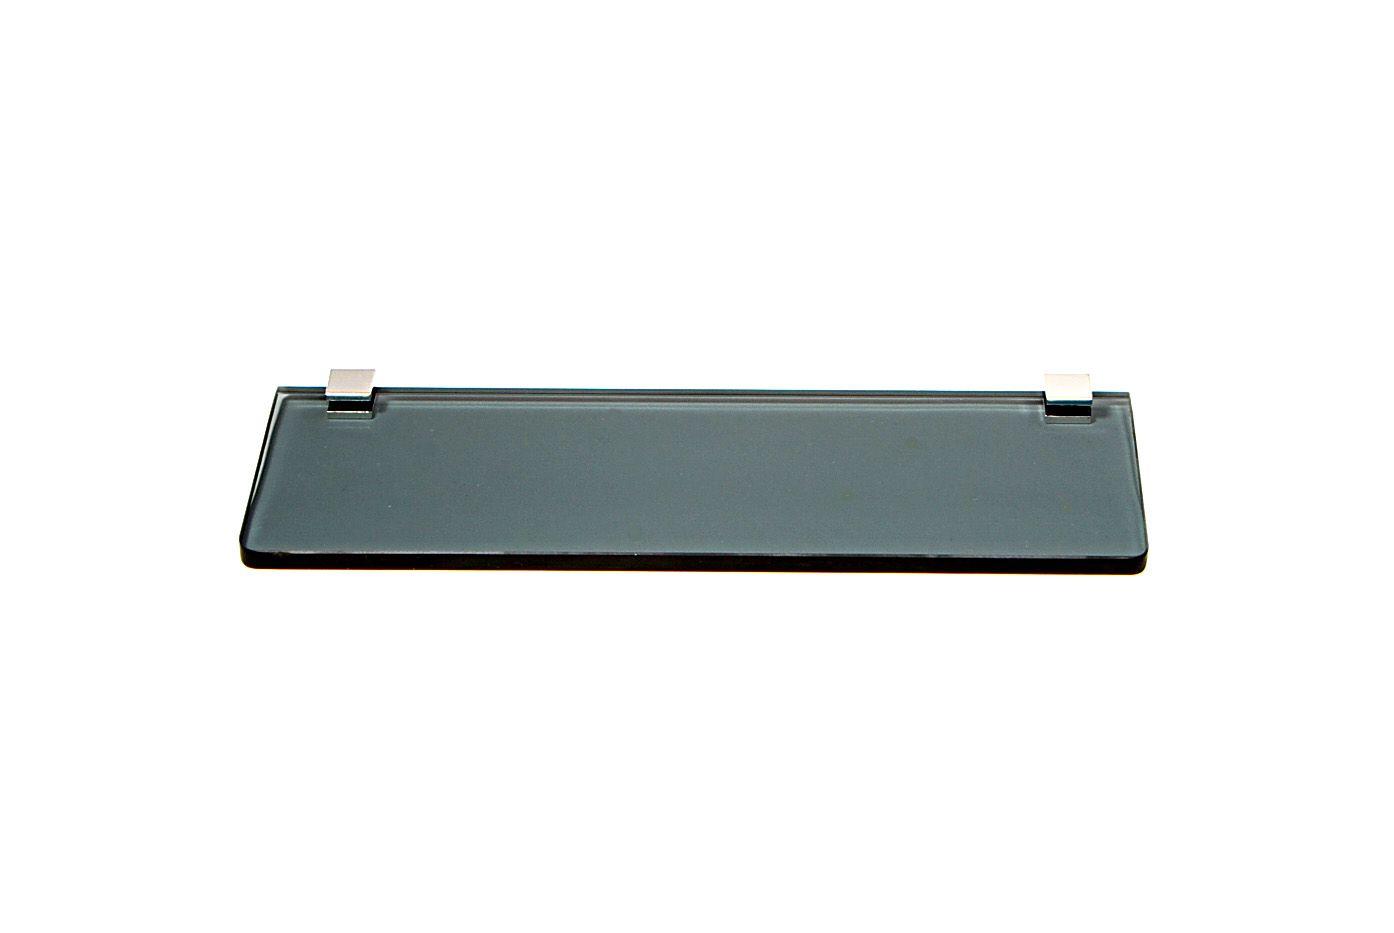 Porta Shampoo Reto em Vidro Fumê Lapidado - Aquabox  - 30cmx9cmx8mm